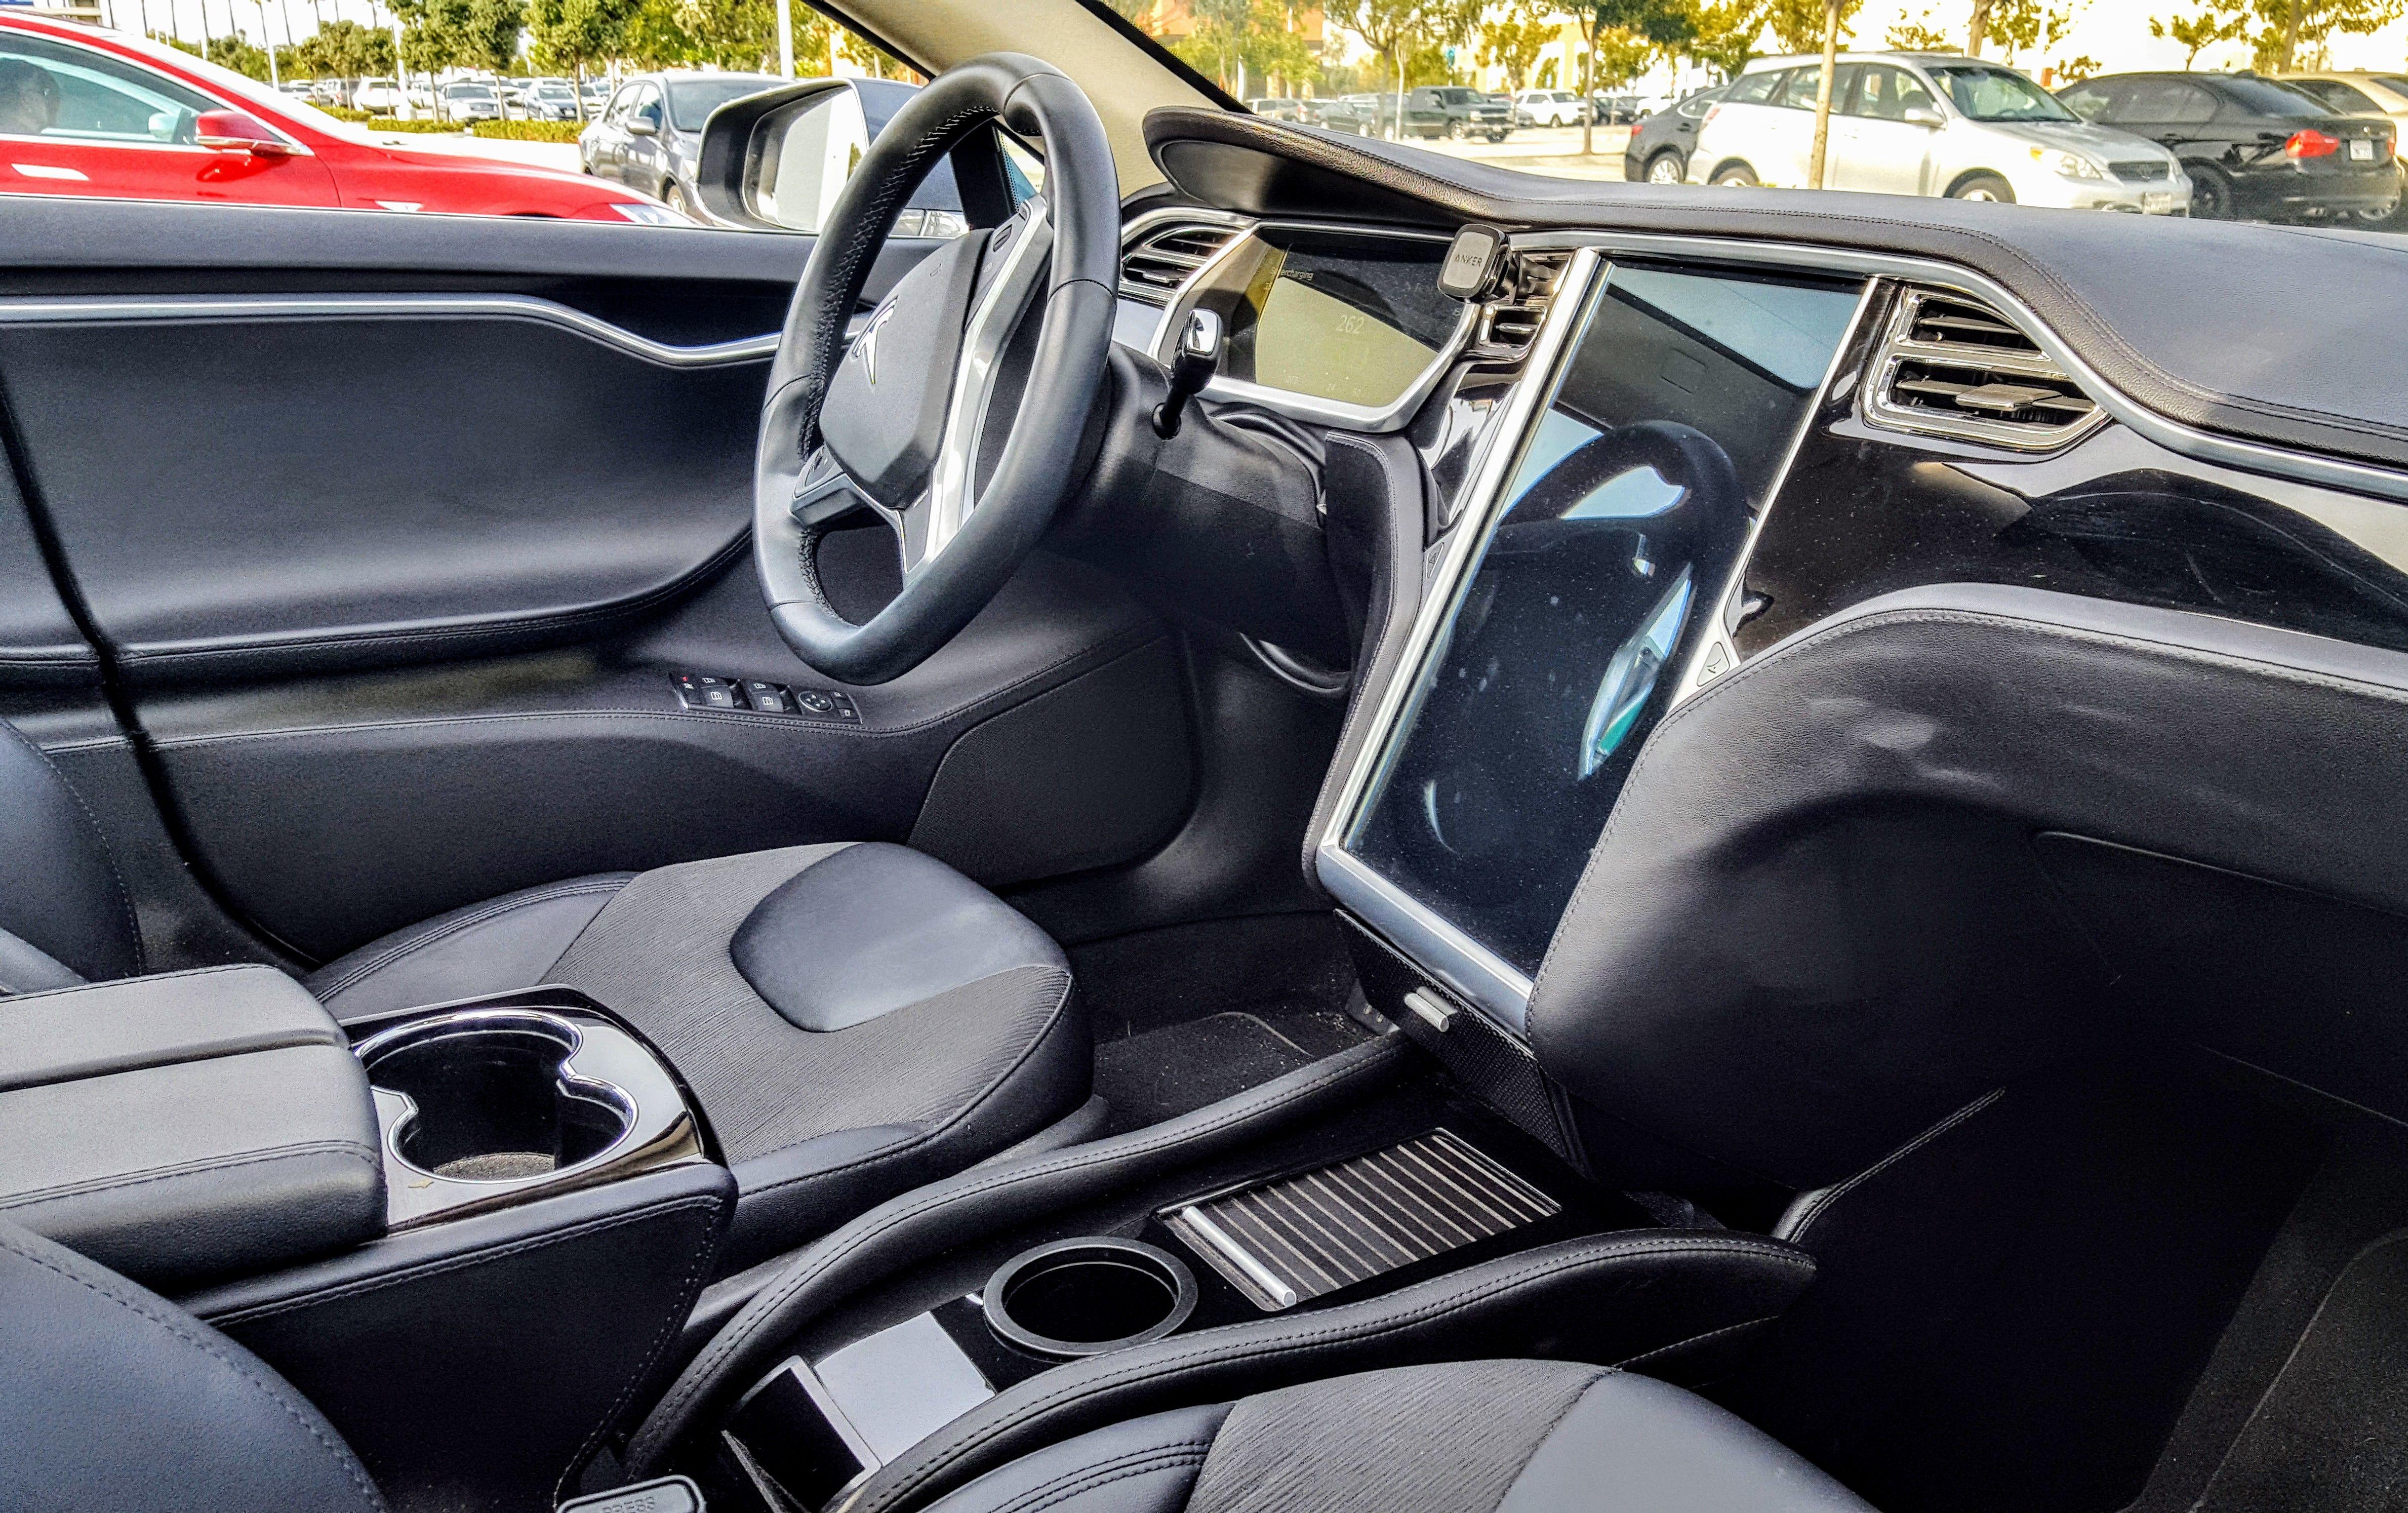 The Ev Annex Tesla Model S Center Console Insert Cleantechnica Review Tesla Model S Tesla Model Tesla